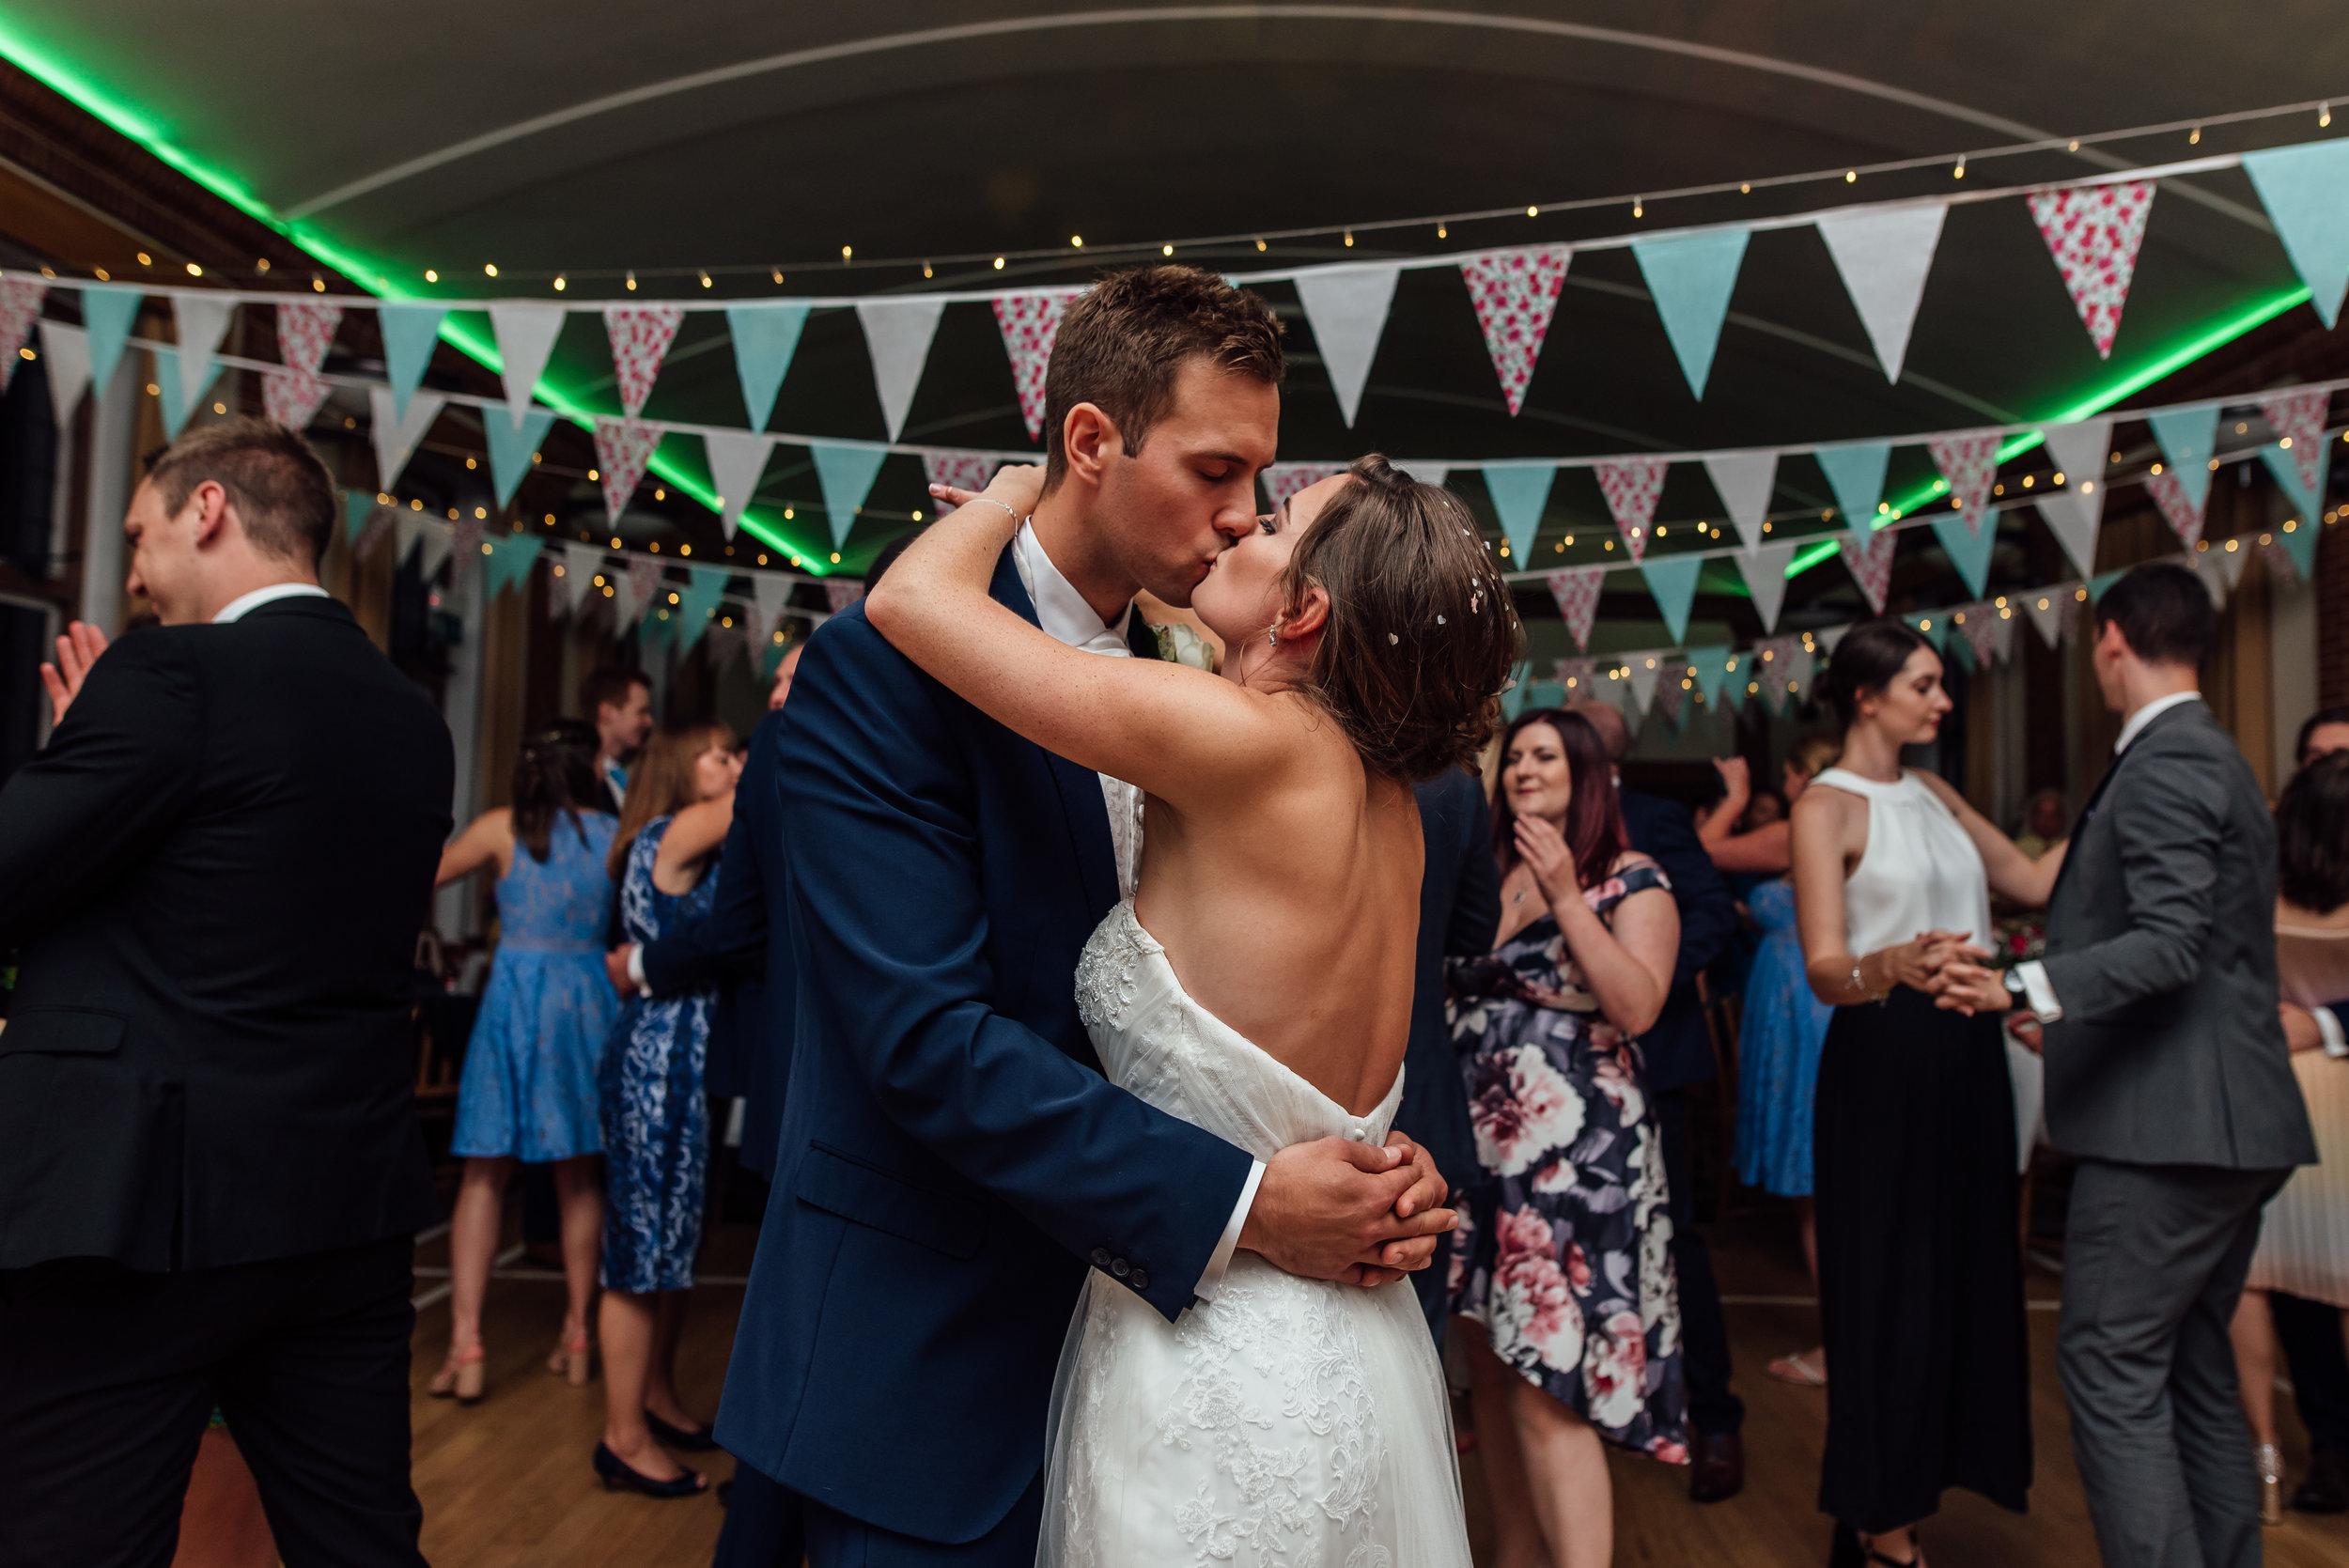 bride-groom-first-dance / rotherwick-village-hall-wedding-hampshire / Amy-james-photography / hampshire-wedding-photographer-hampshire